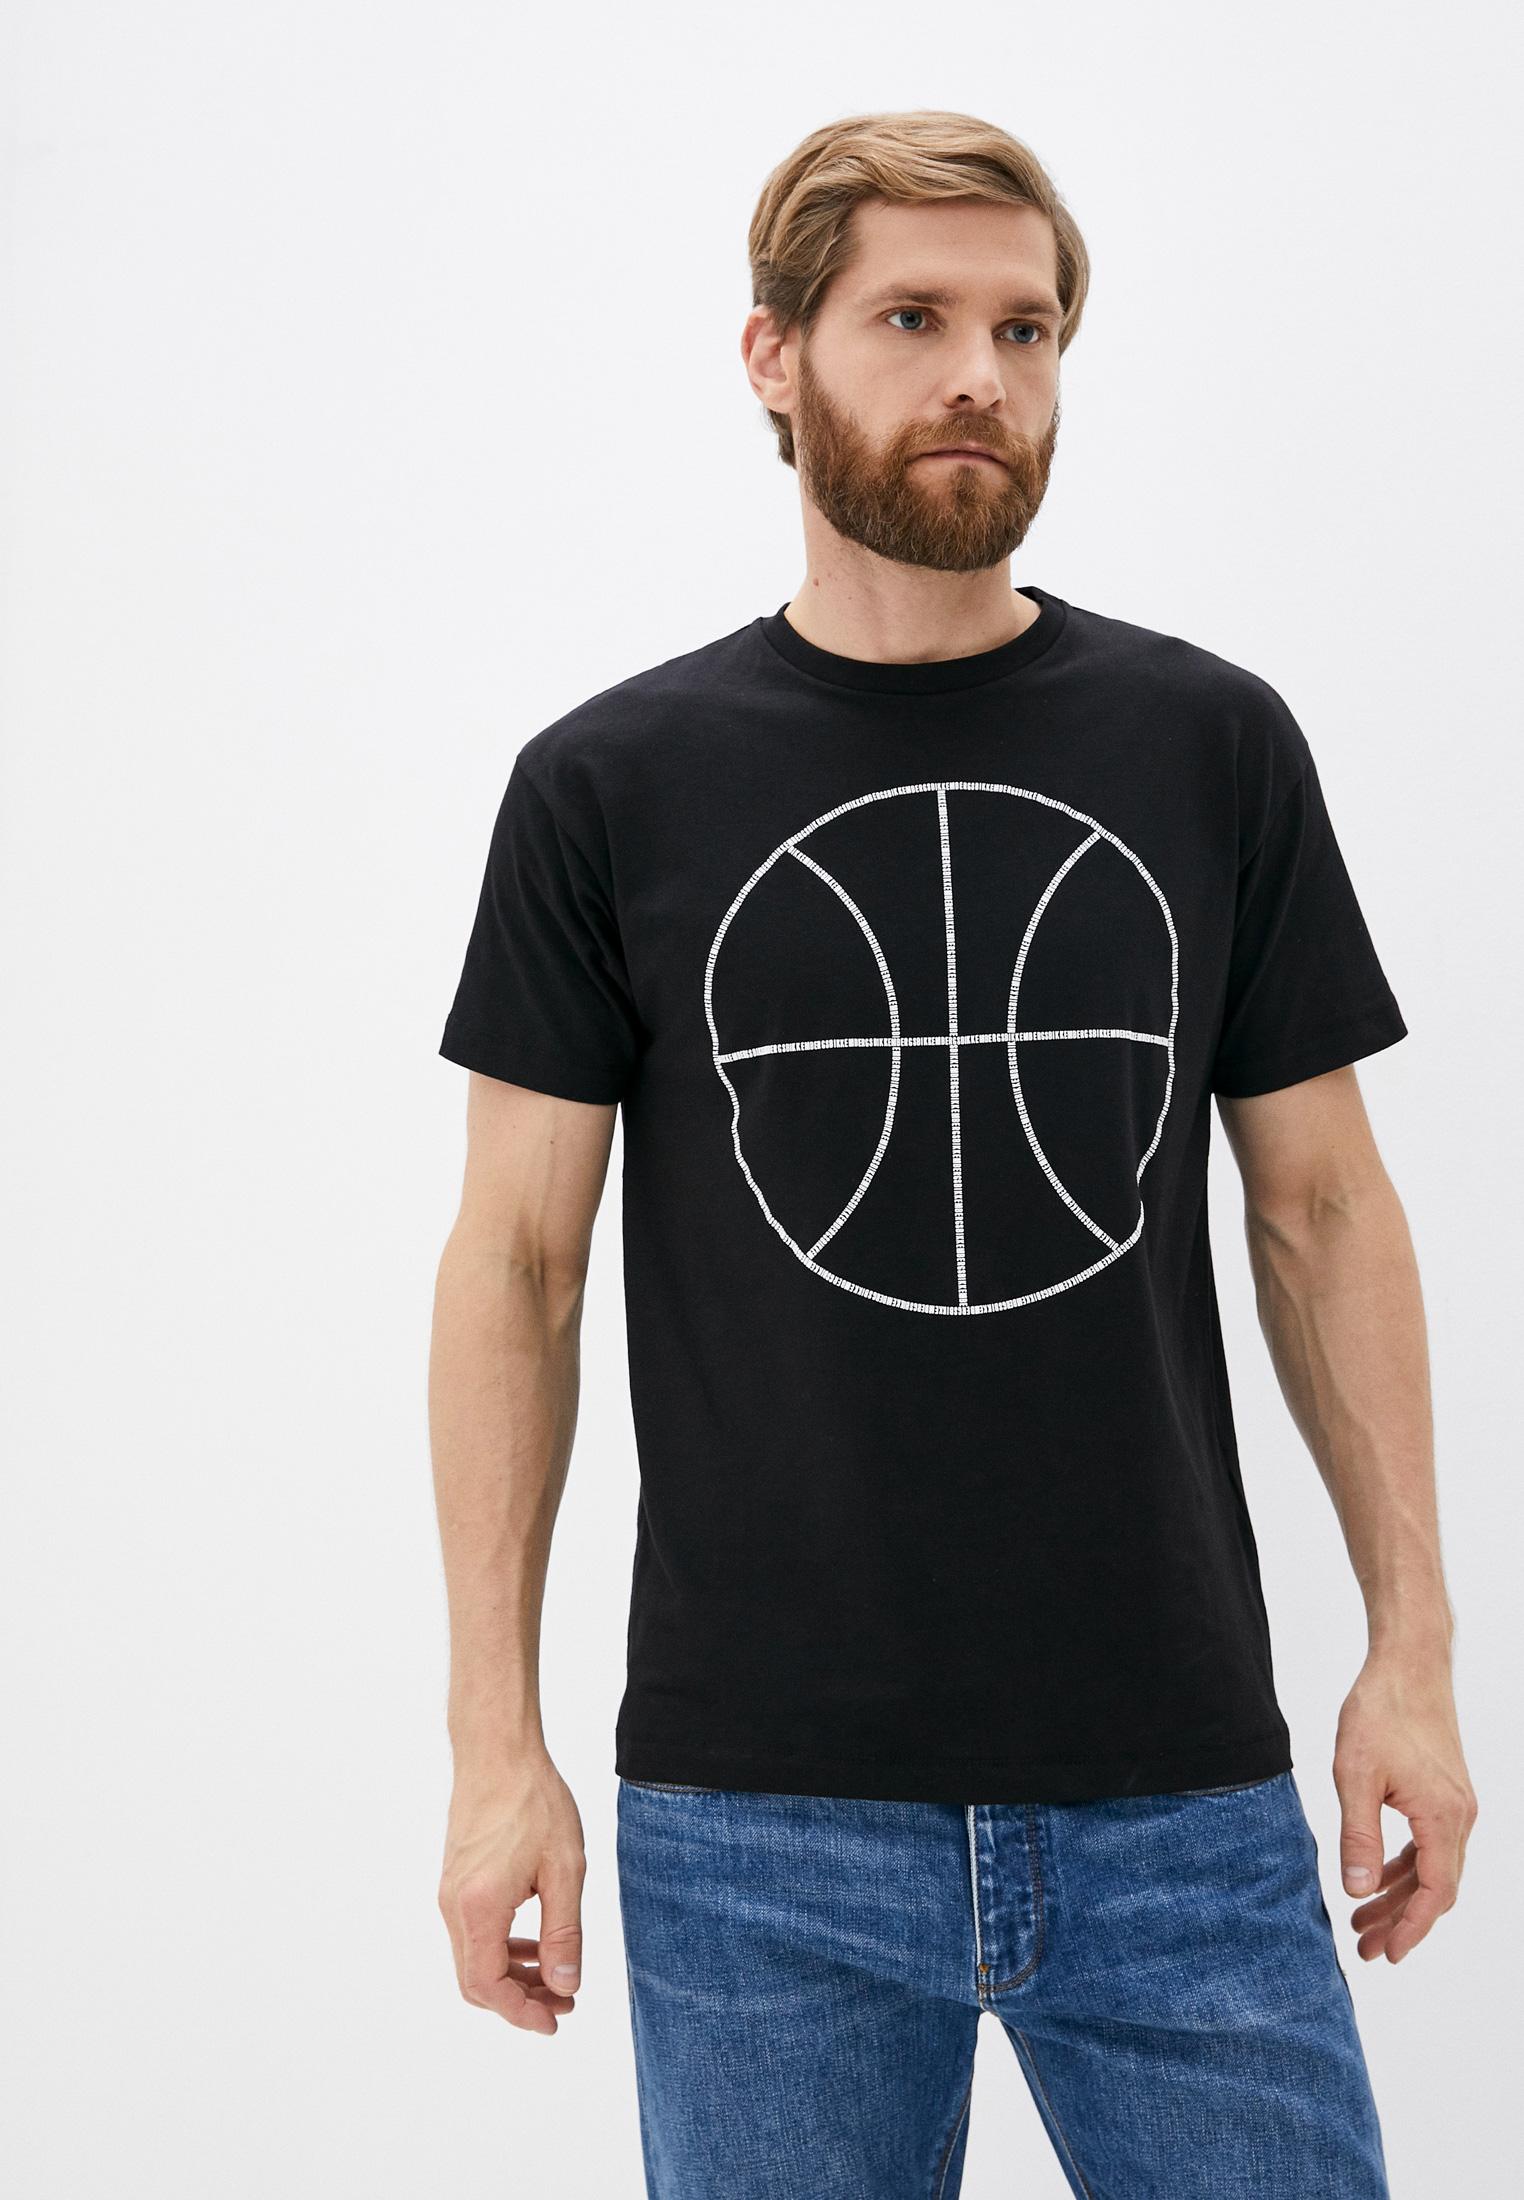 Мужская футболка Bikkembergs (Биккембергс) C 7 022 4R E 1814